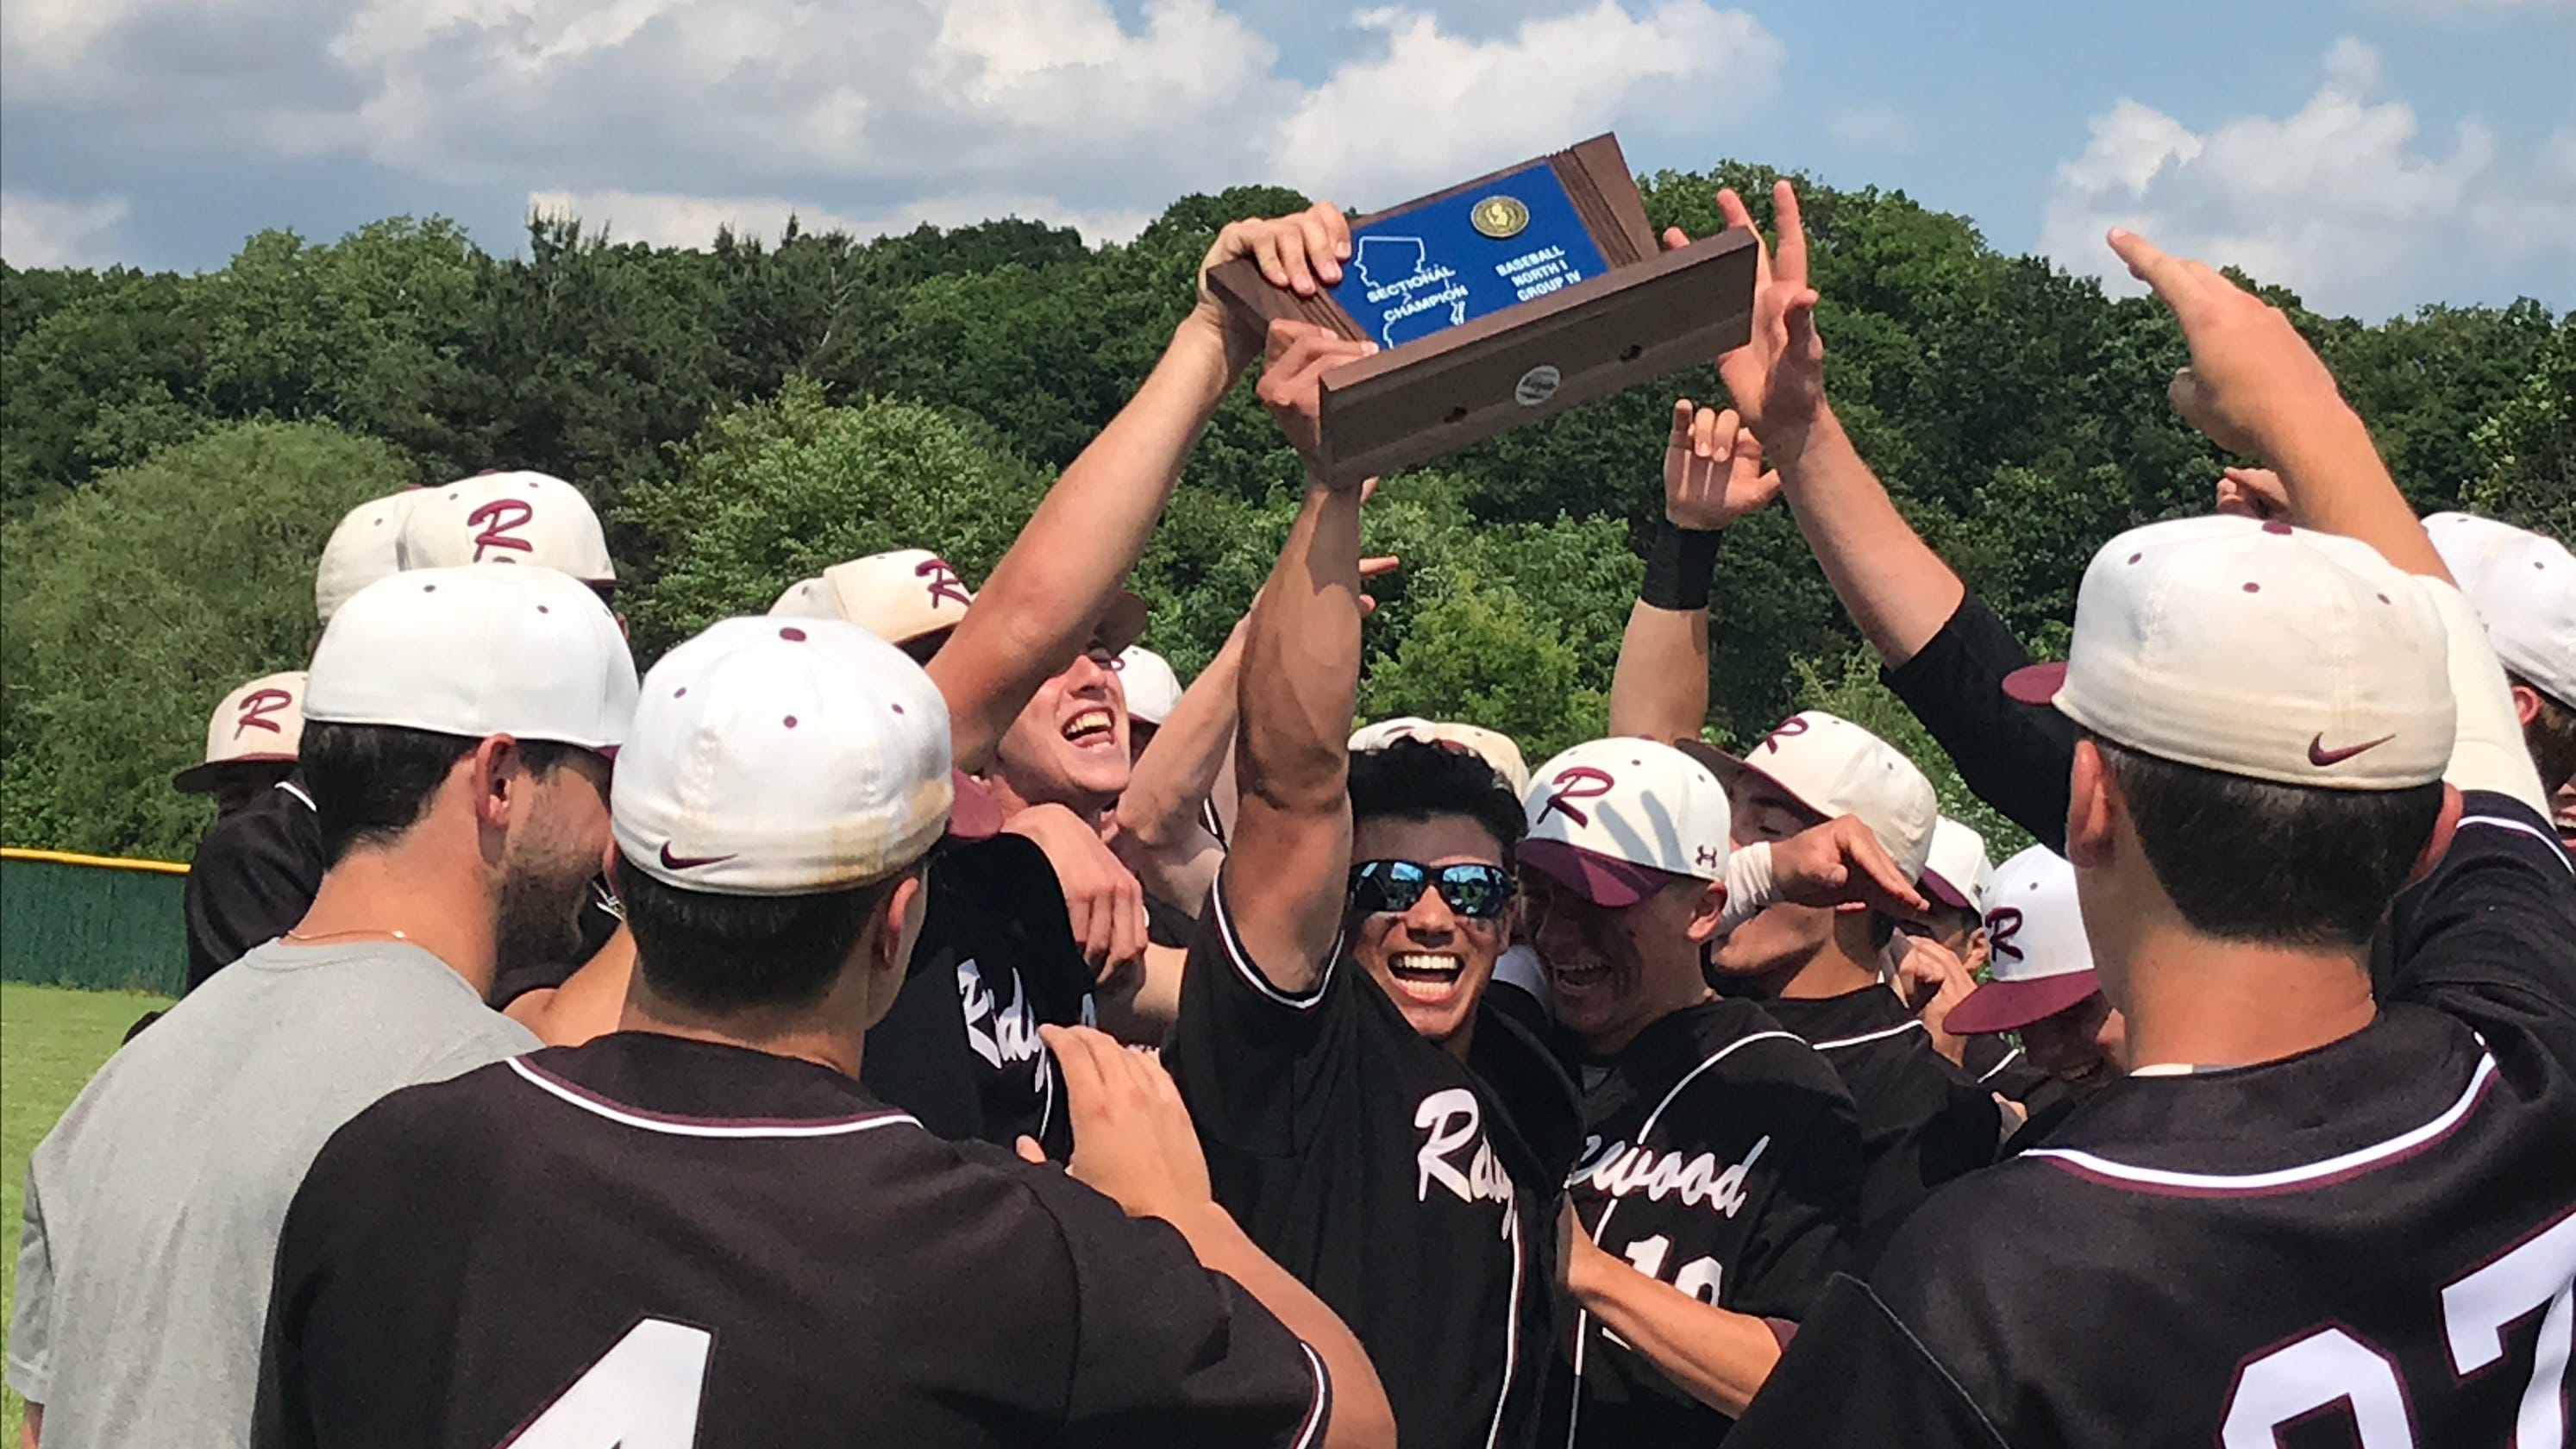 NJ Baseball: Ridgewood Wins Third Straight Sectional Title